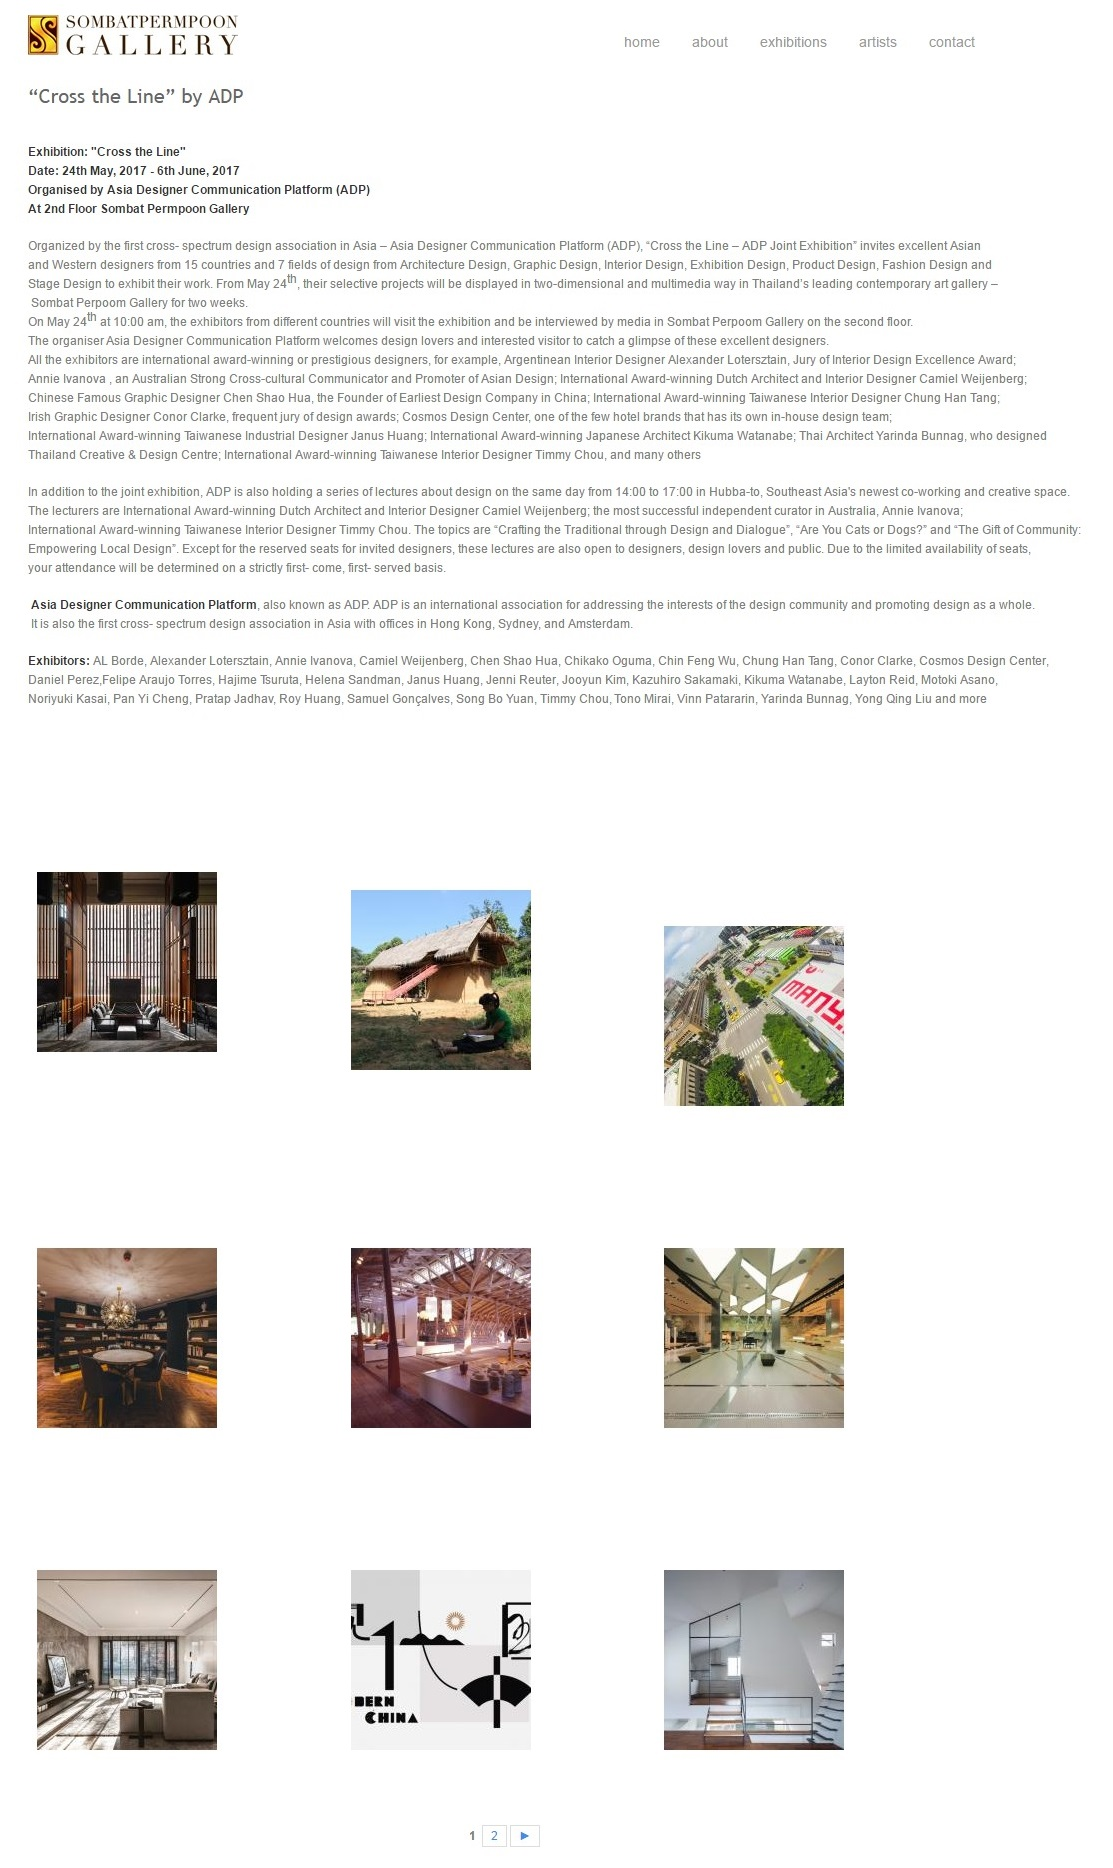 15. Sombat Permpoon Gallery.jpg